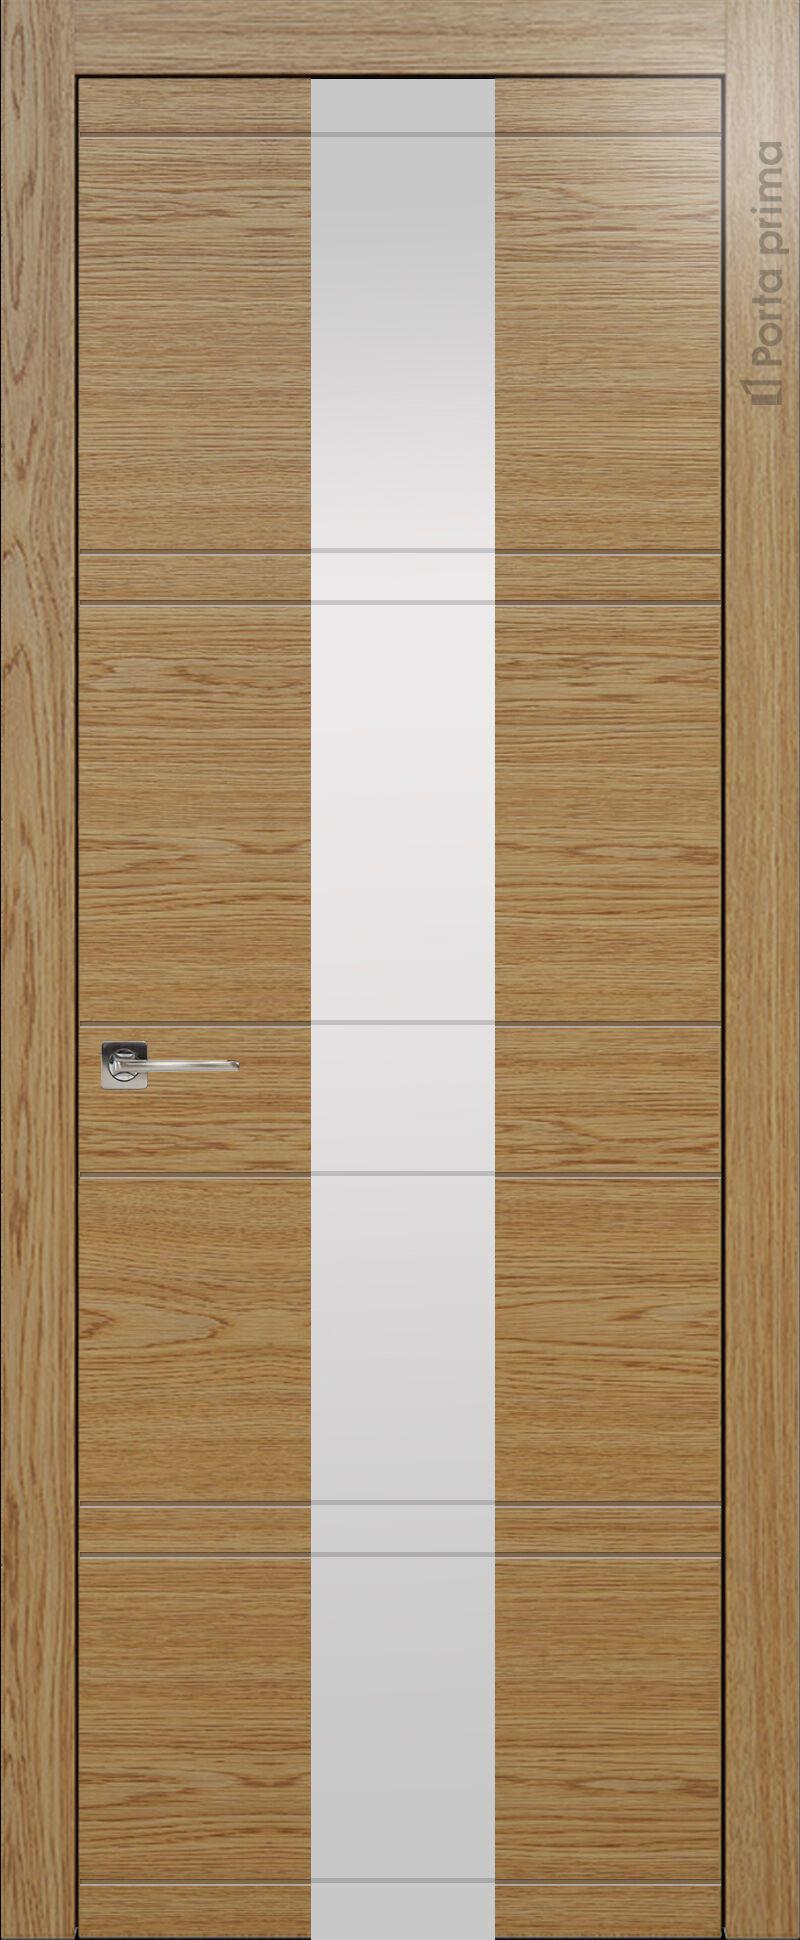 Tivoli Ж-2 цвет - Дуб карамель Со стеклом (ДО)